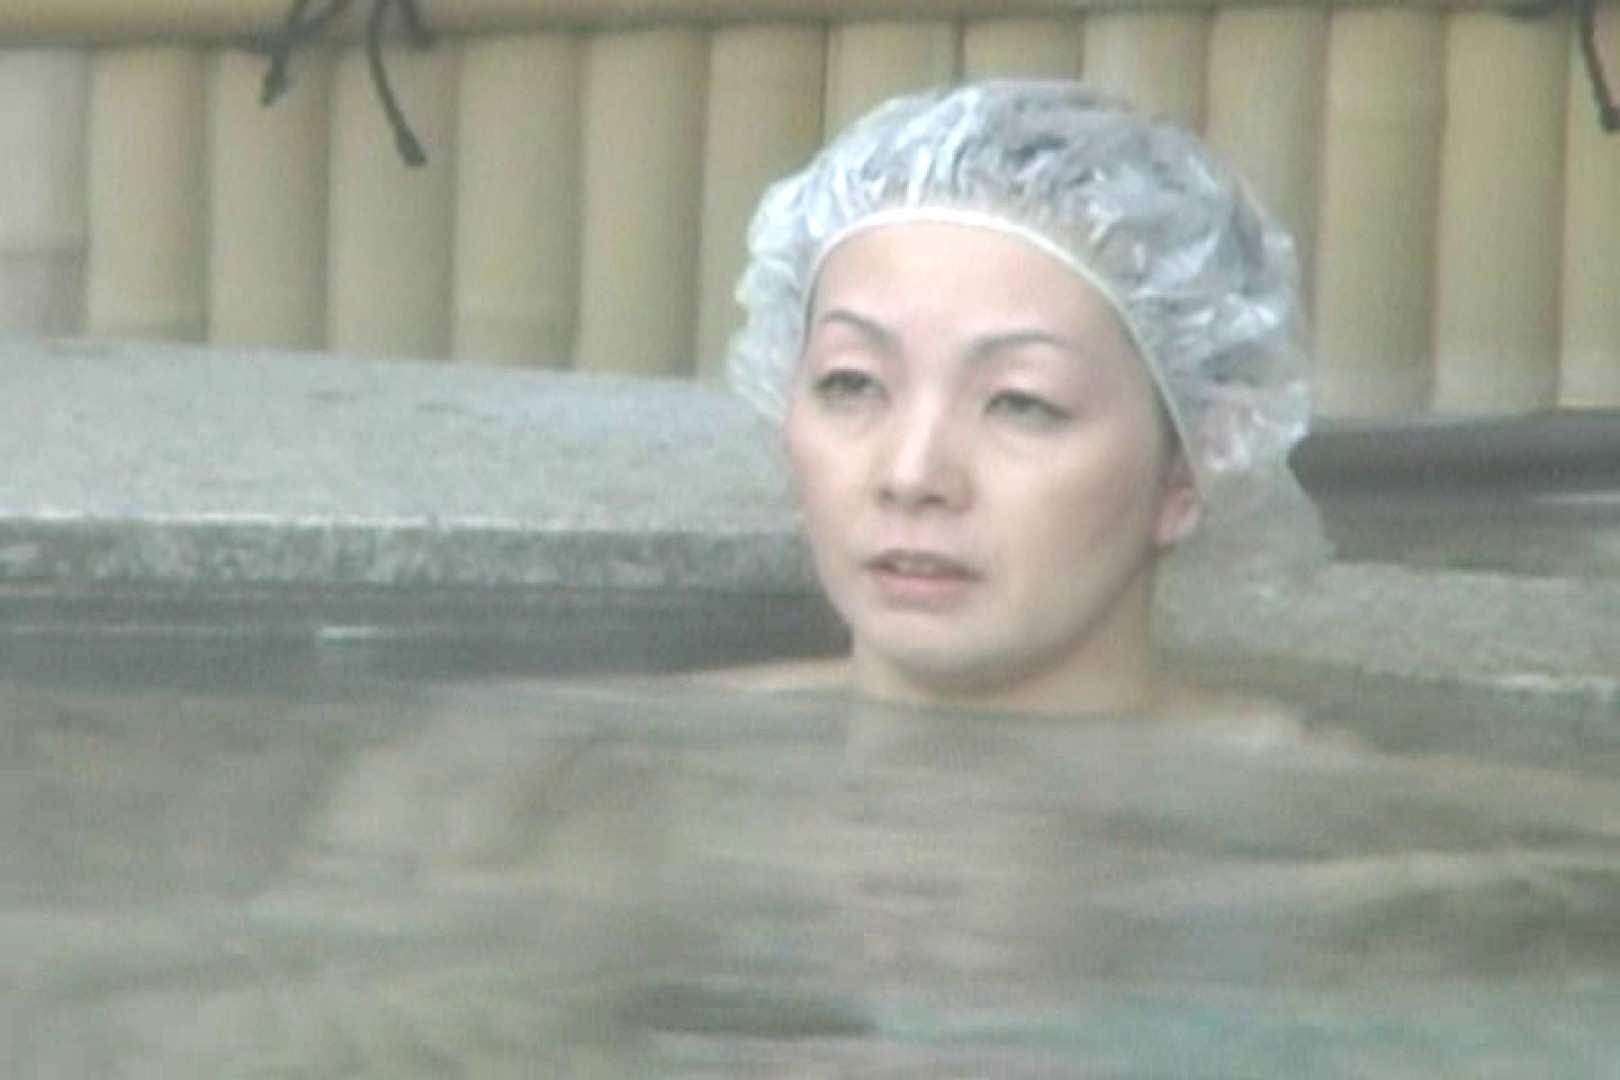 Aquaな露天風呂Vol.592 盗撮特撮 おまんこ動画流出 12pic 5